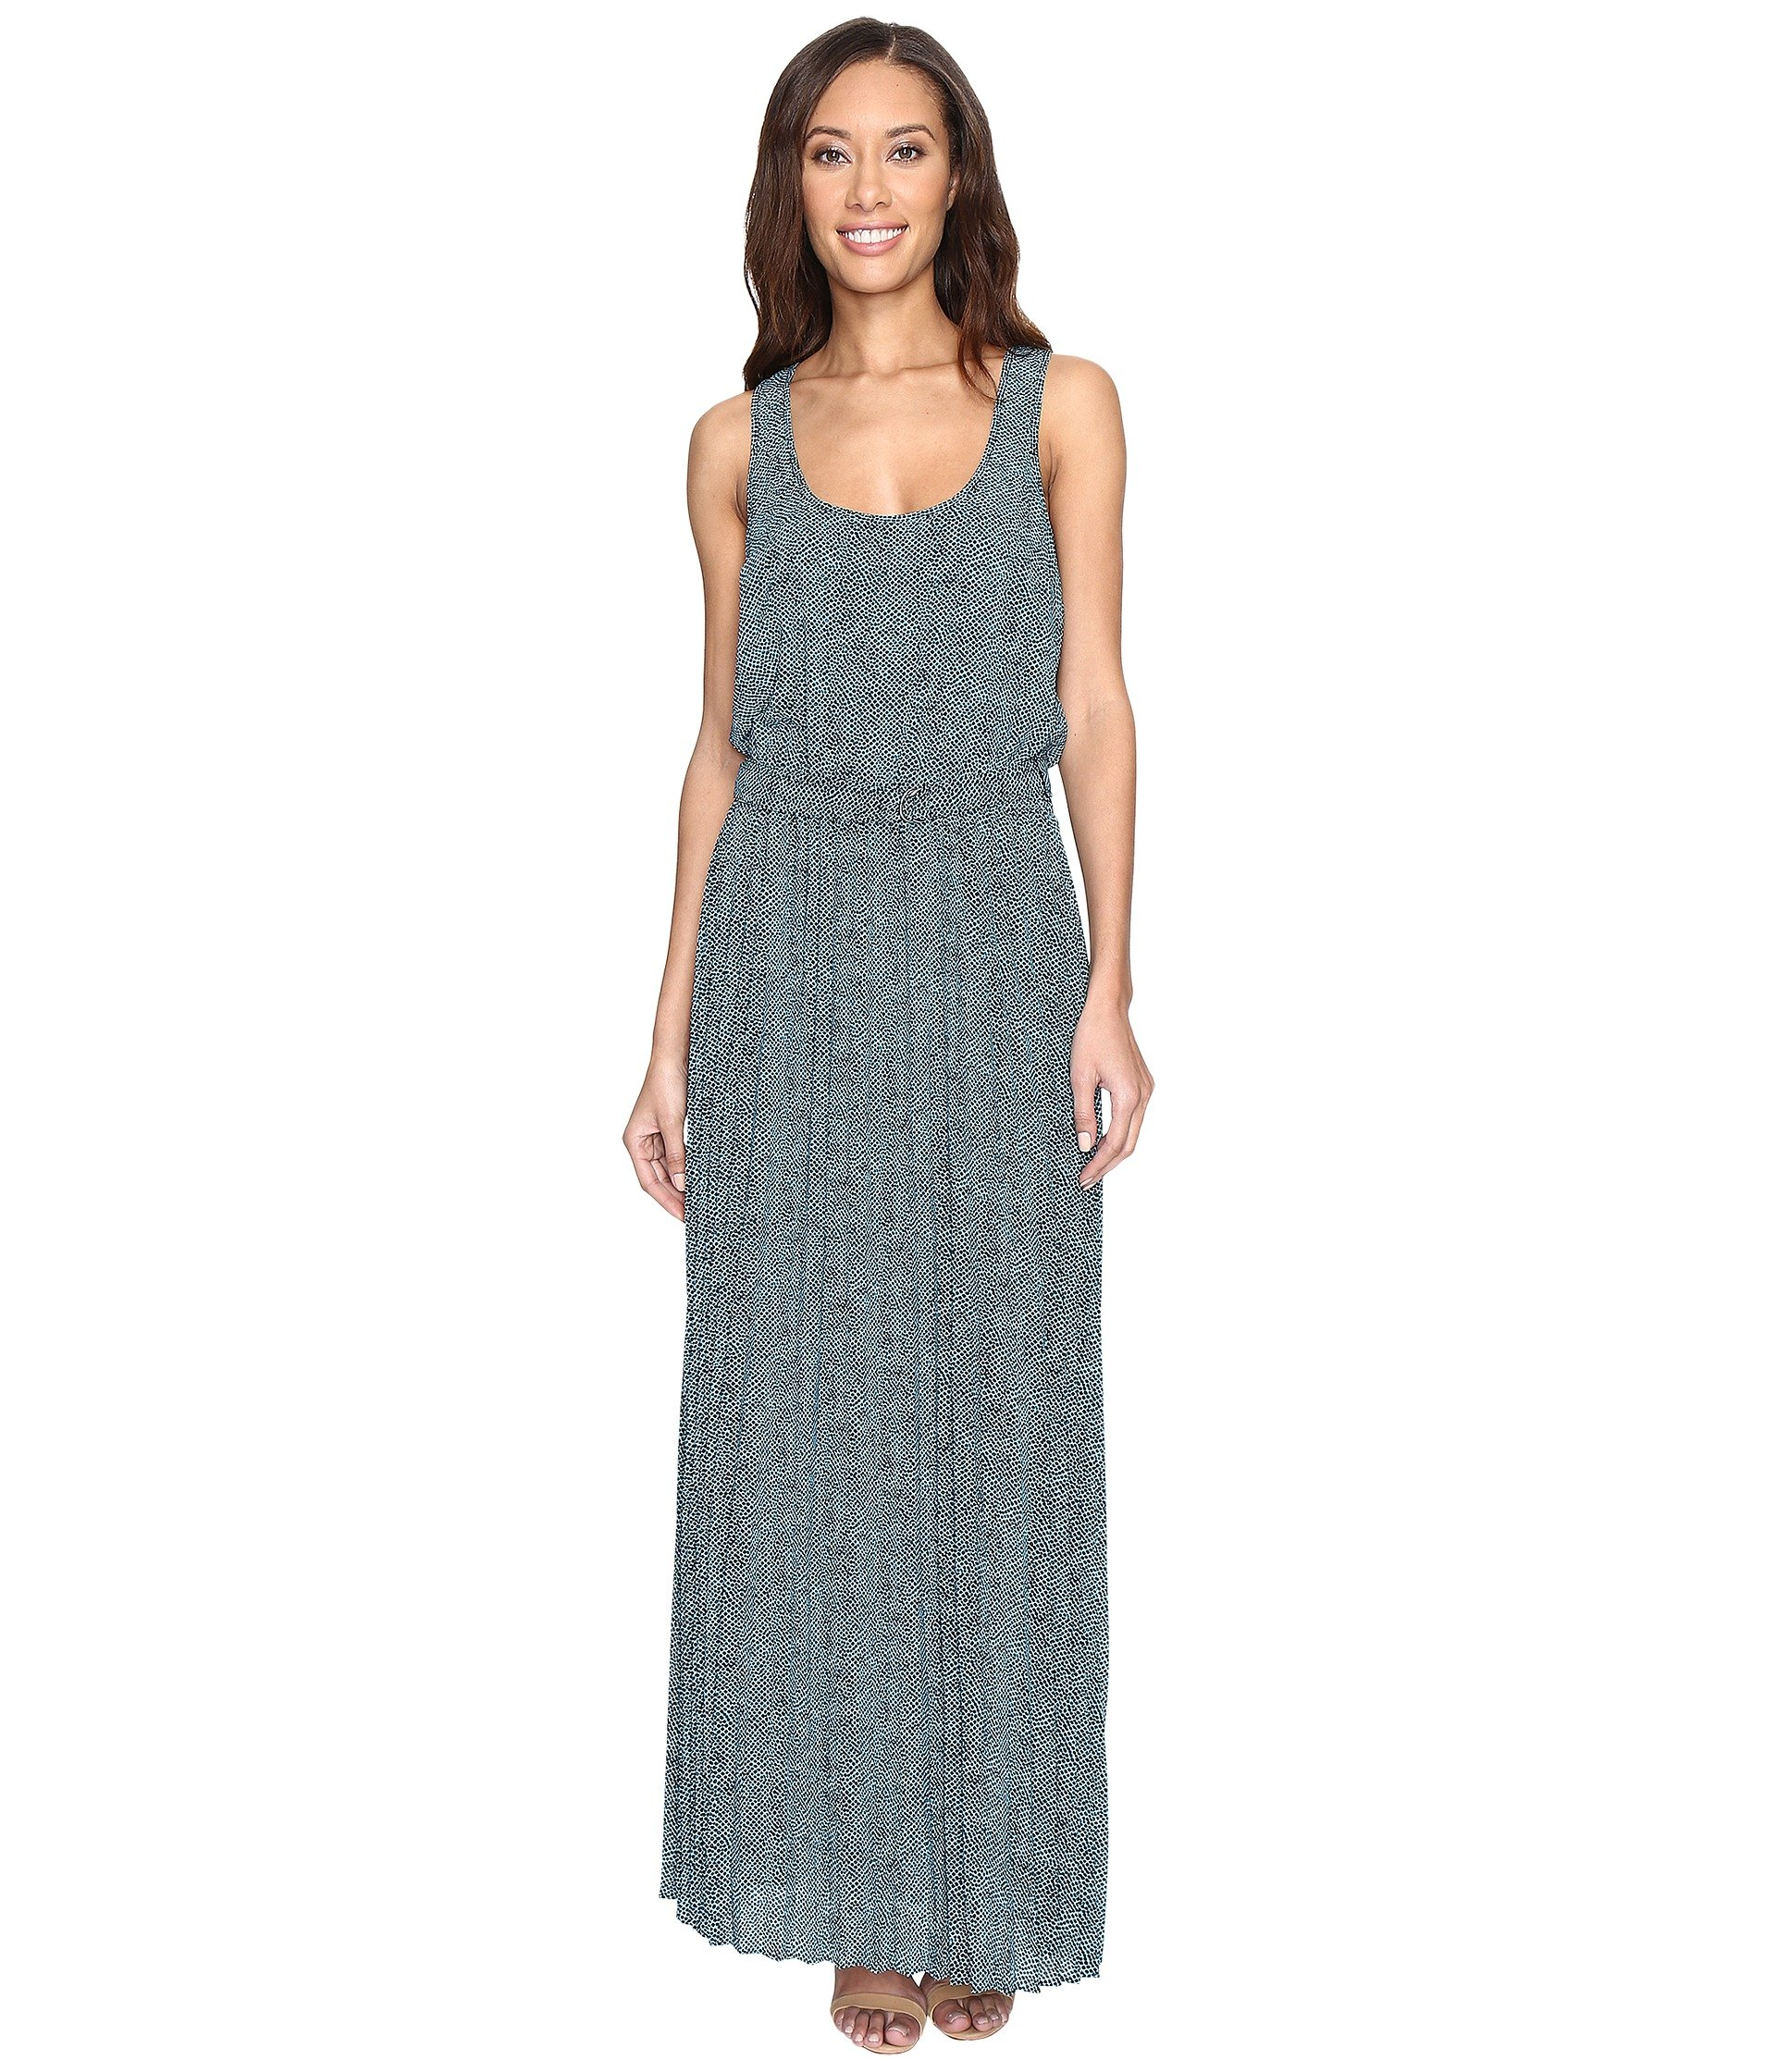 Stingray Tank Dress, Turquoise